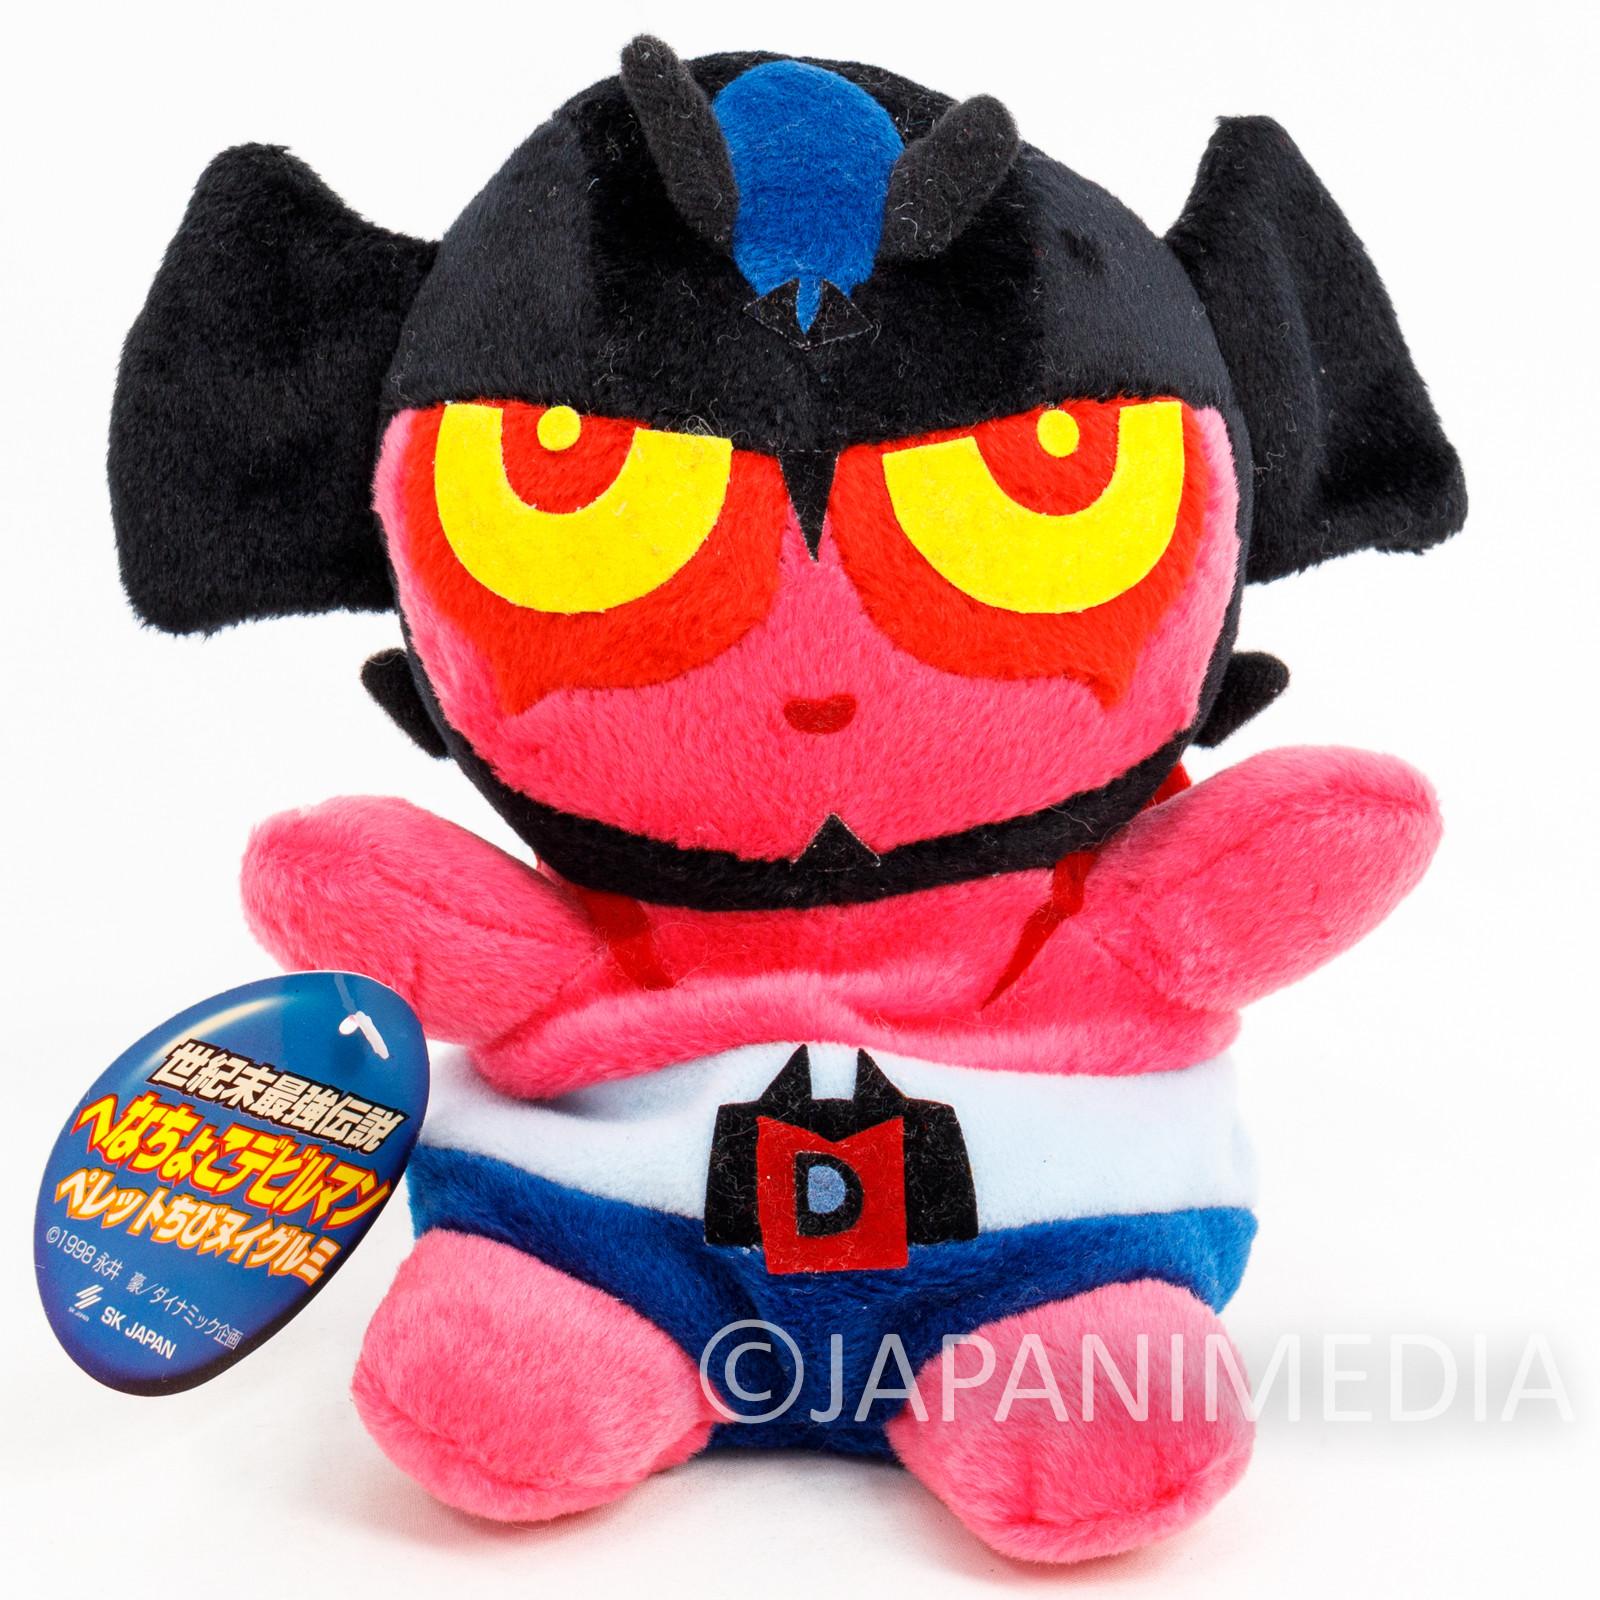 "Devilman Pellet Filled Plush Doll 6"" Red SK Japan JAPAN ANIME"